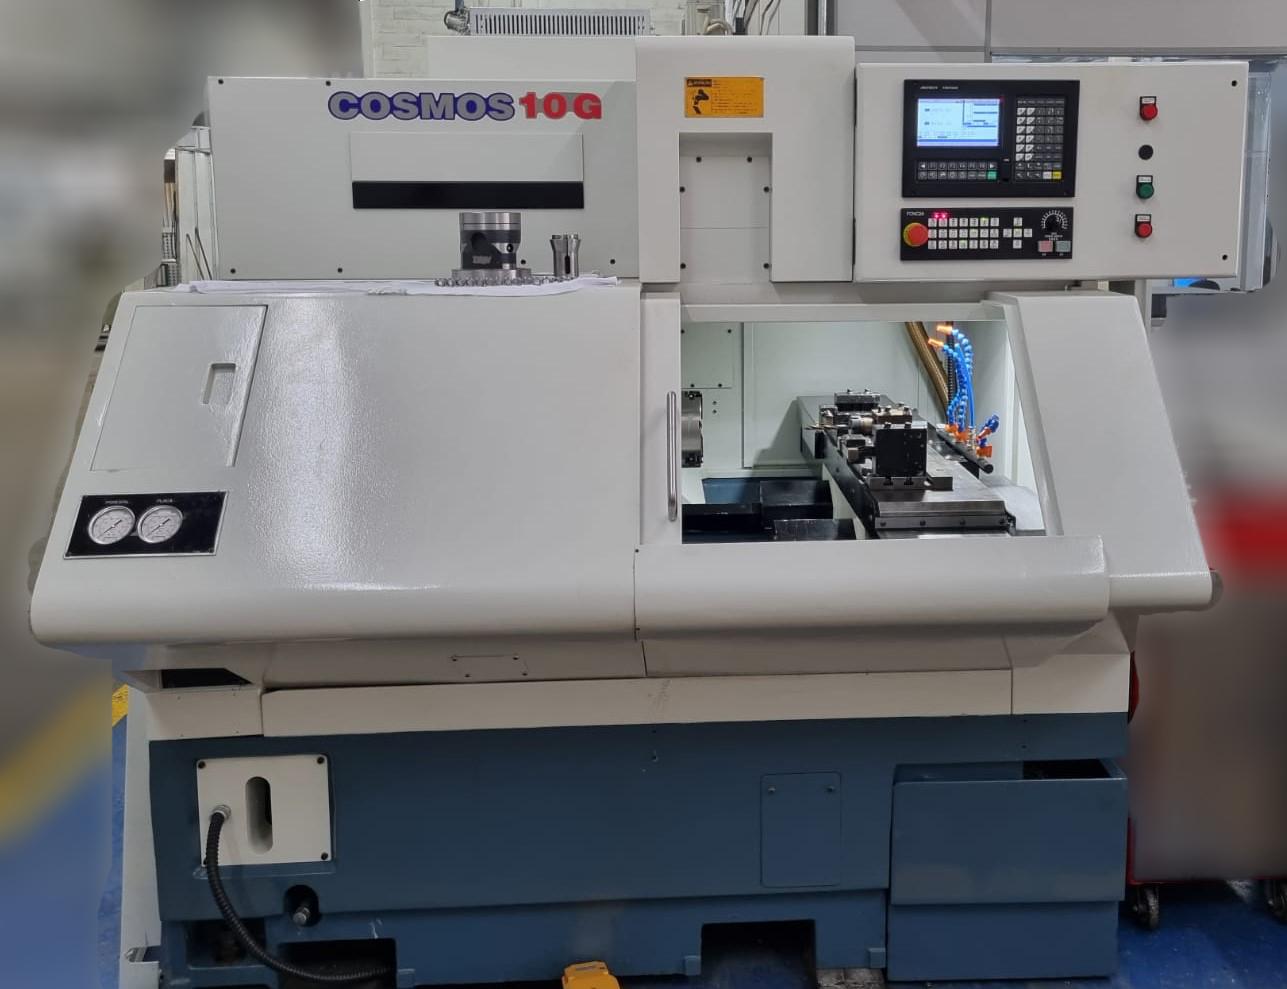 TORNO CNC ROMI MAZAK - COSMOS 10G